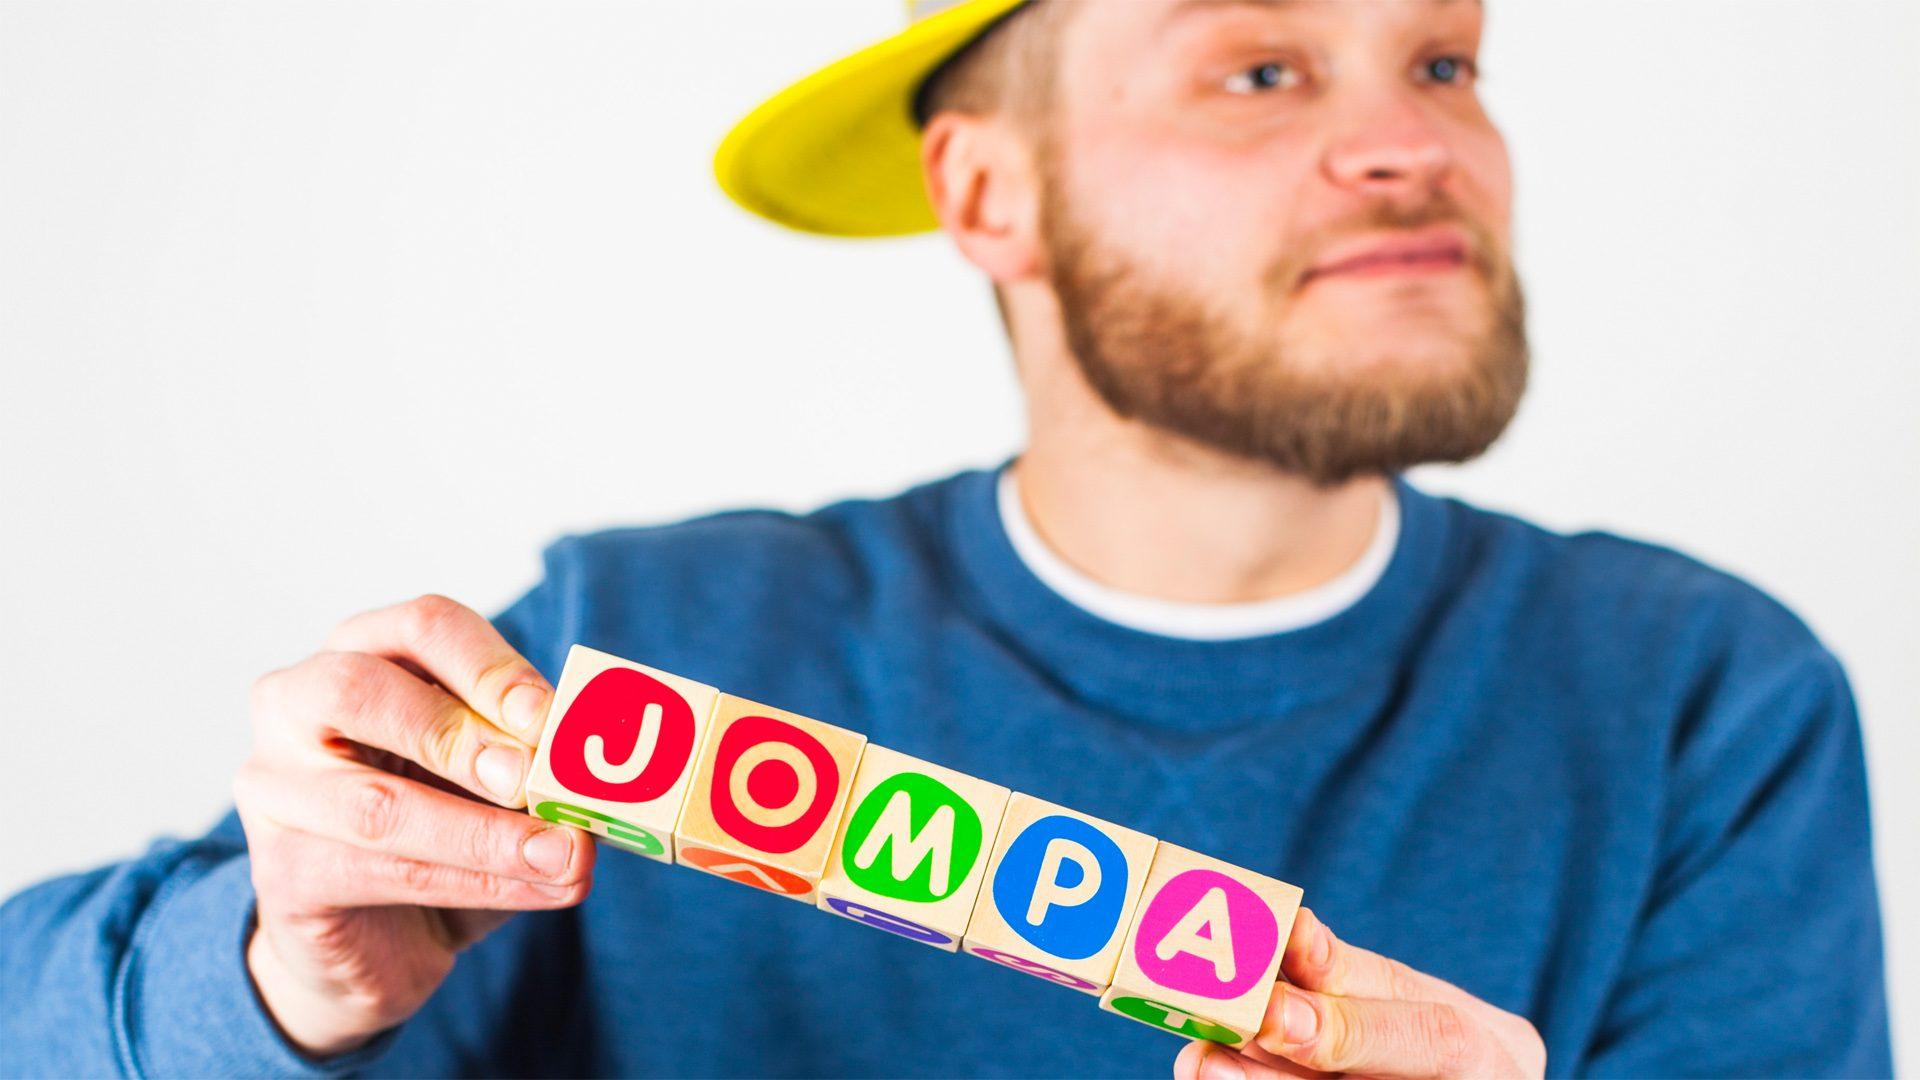 Jompa_1920x1080